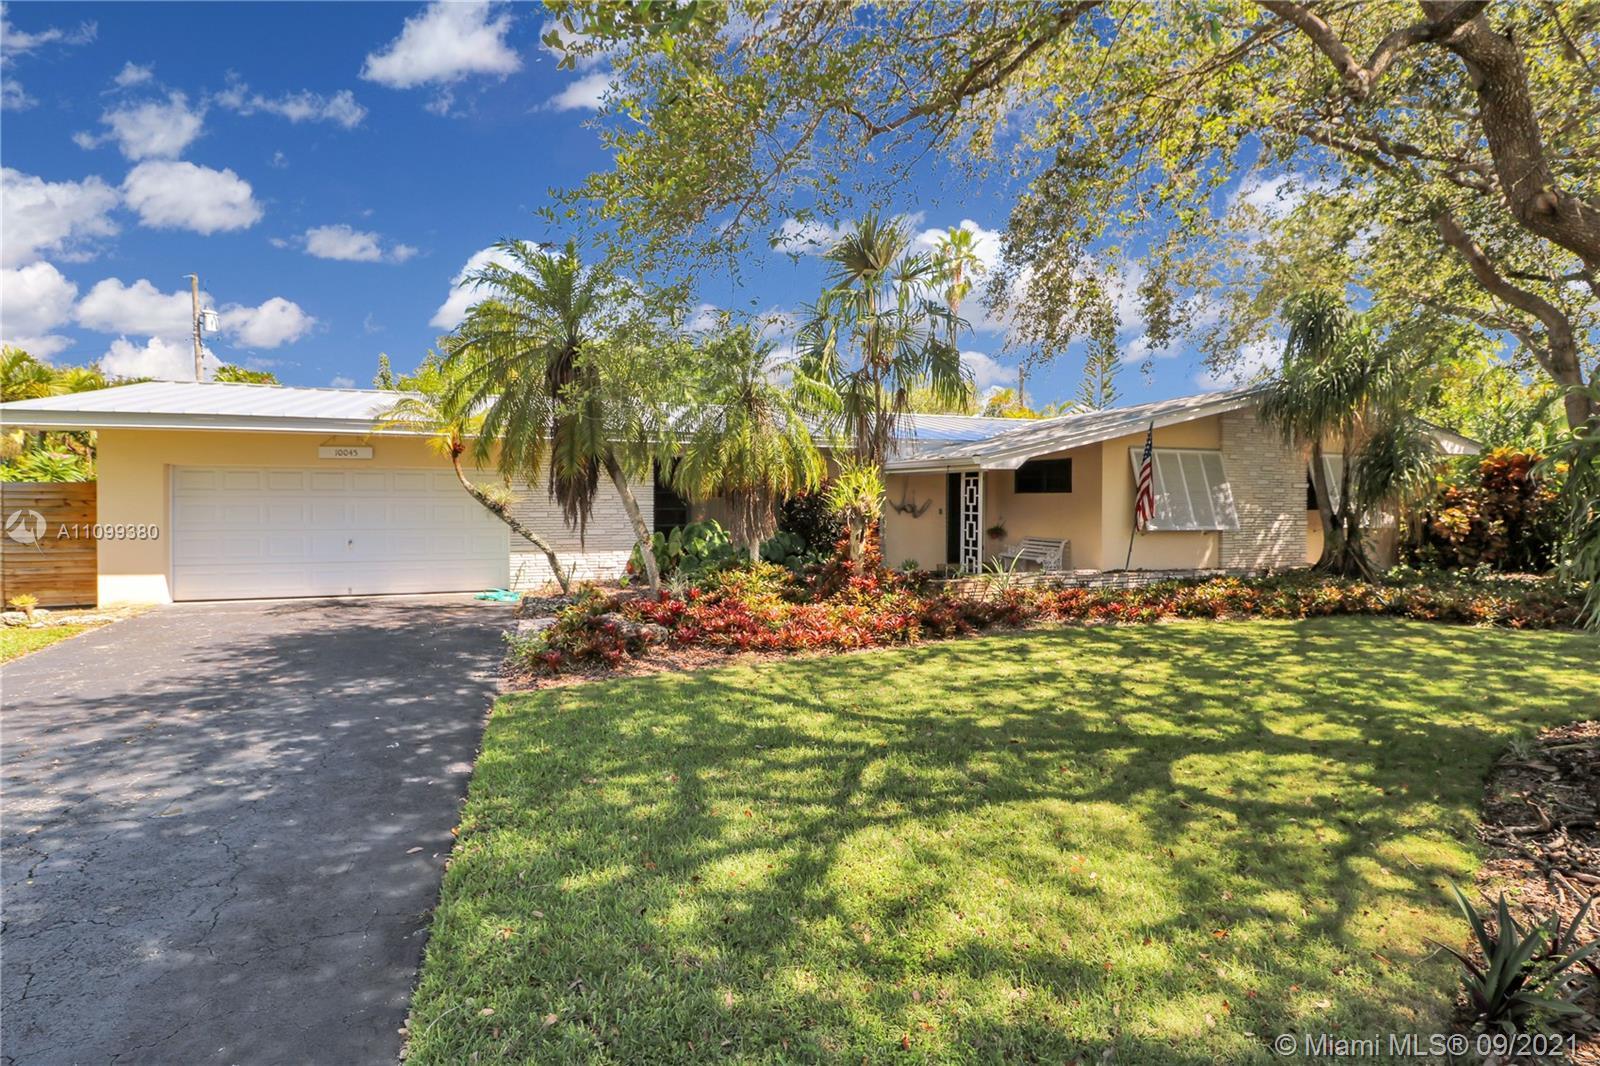 10045 136th St, Miami, Florida 33176